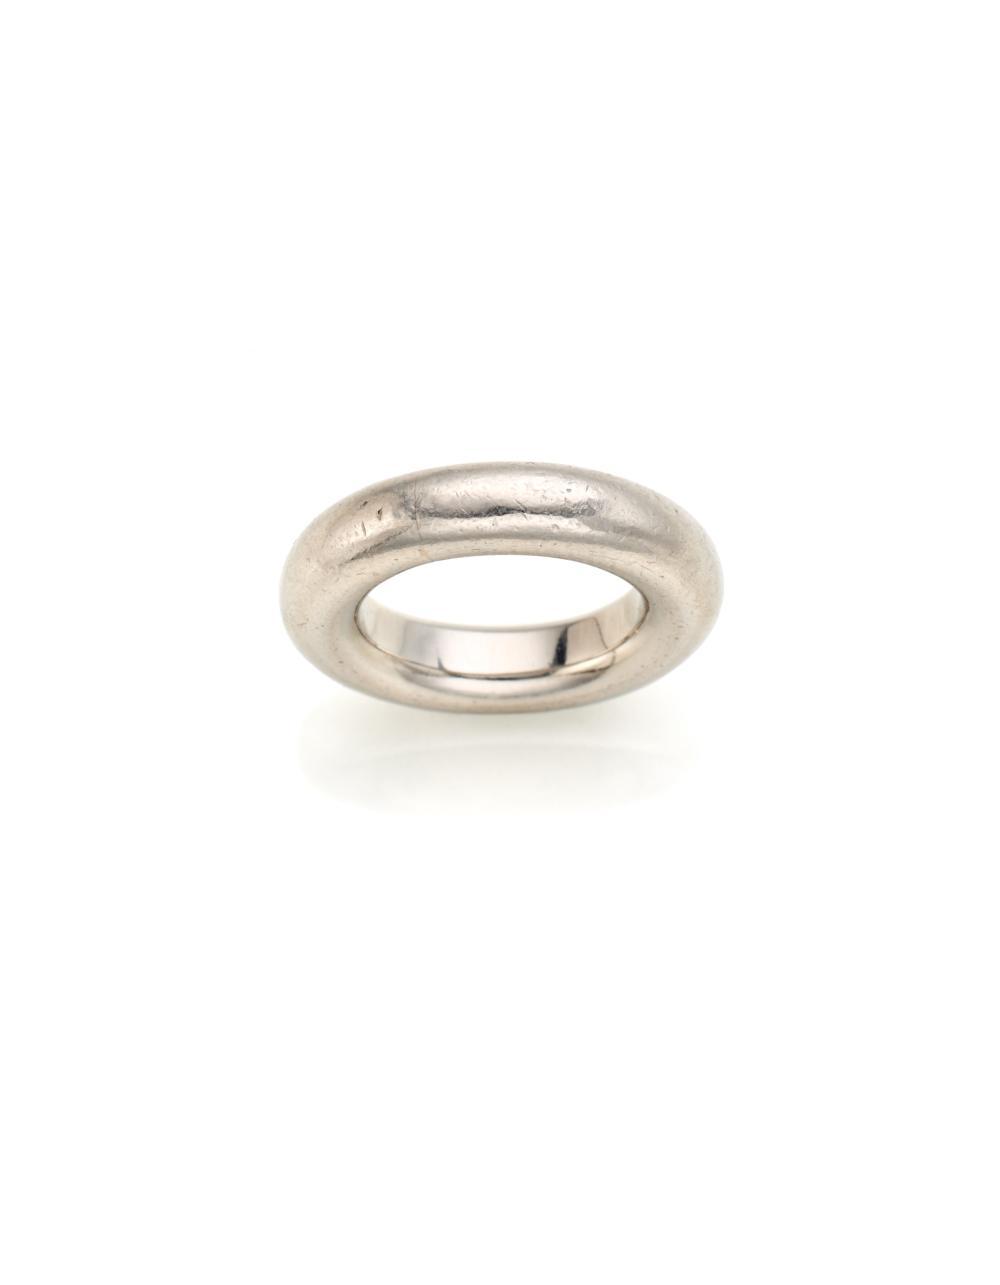 Platinum wedding ring, g 23.97 circa size 7/47. (slight defects)...